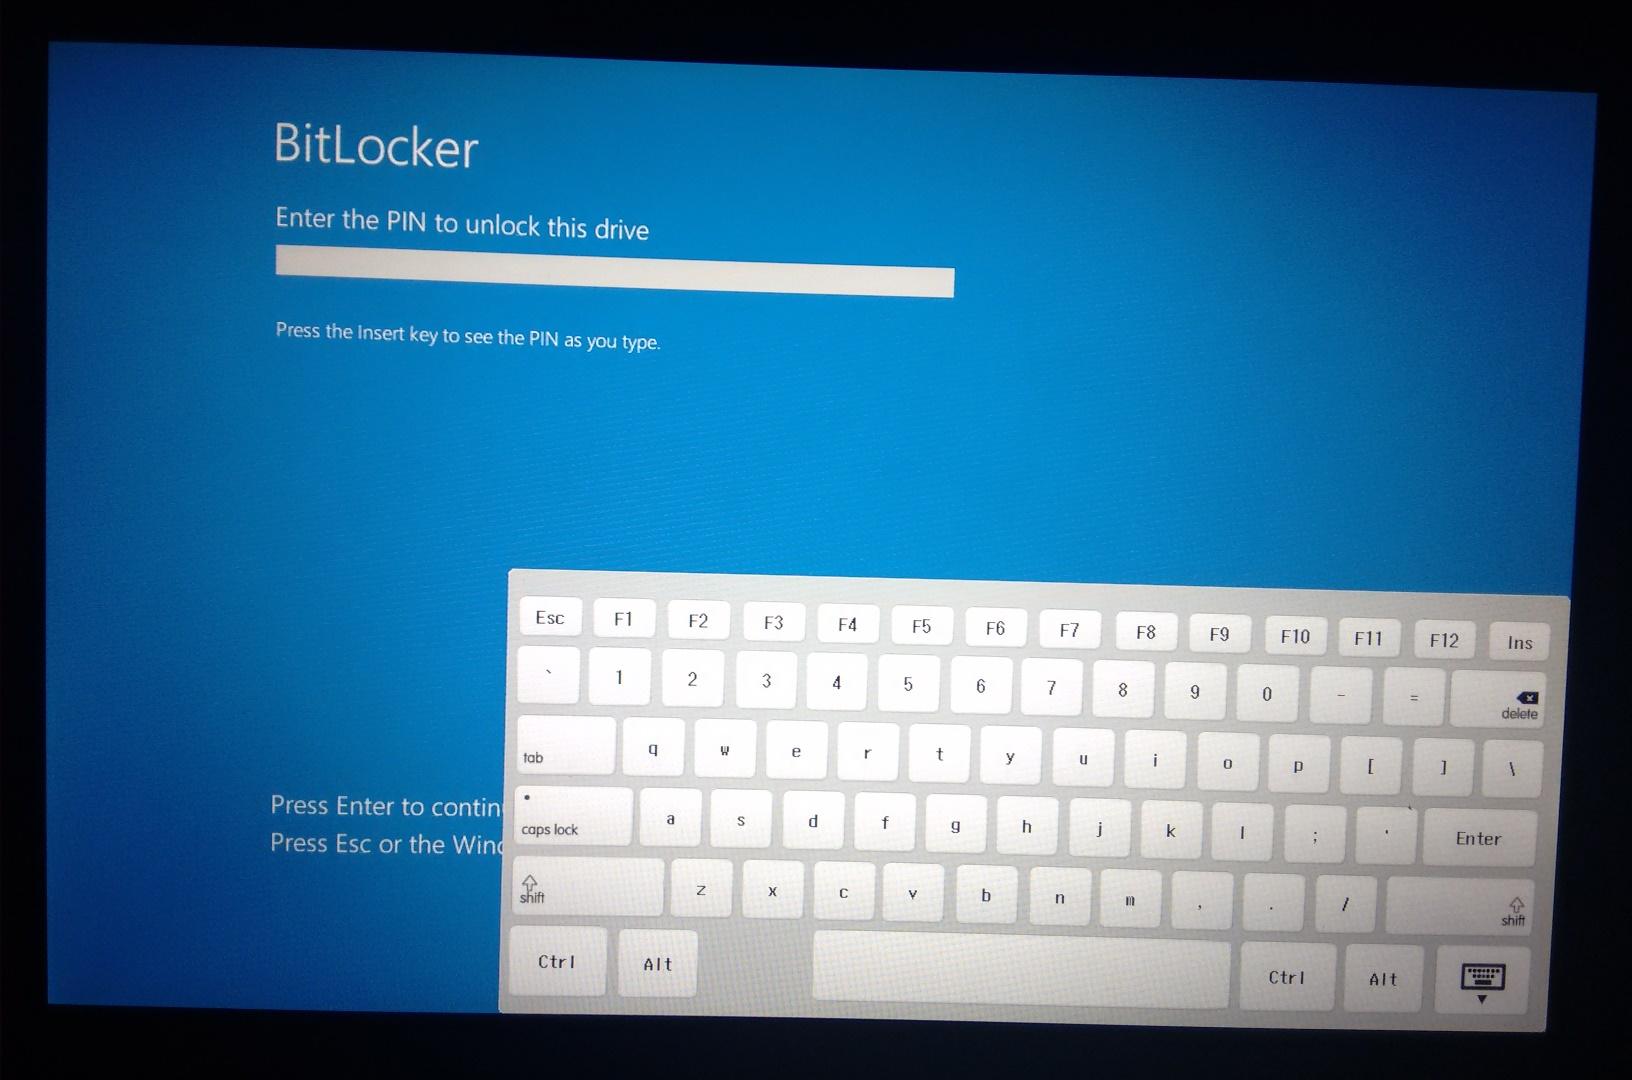 entering bitlocker pin keyboard shows up but doesn 39 t work hp support forum 5692744. Black Bedroom Furniture Sets. Home Design Ideas